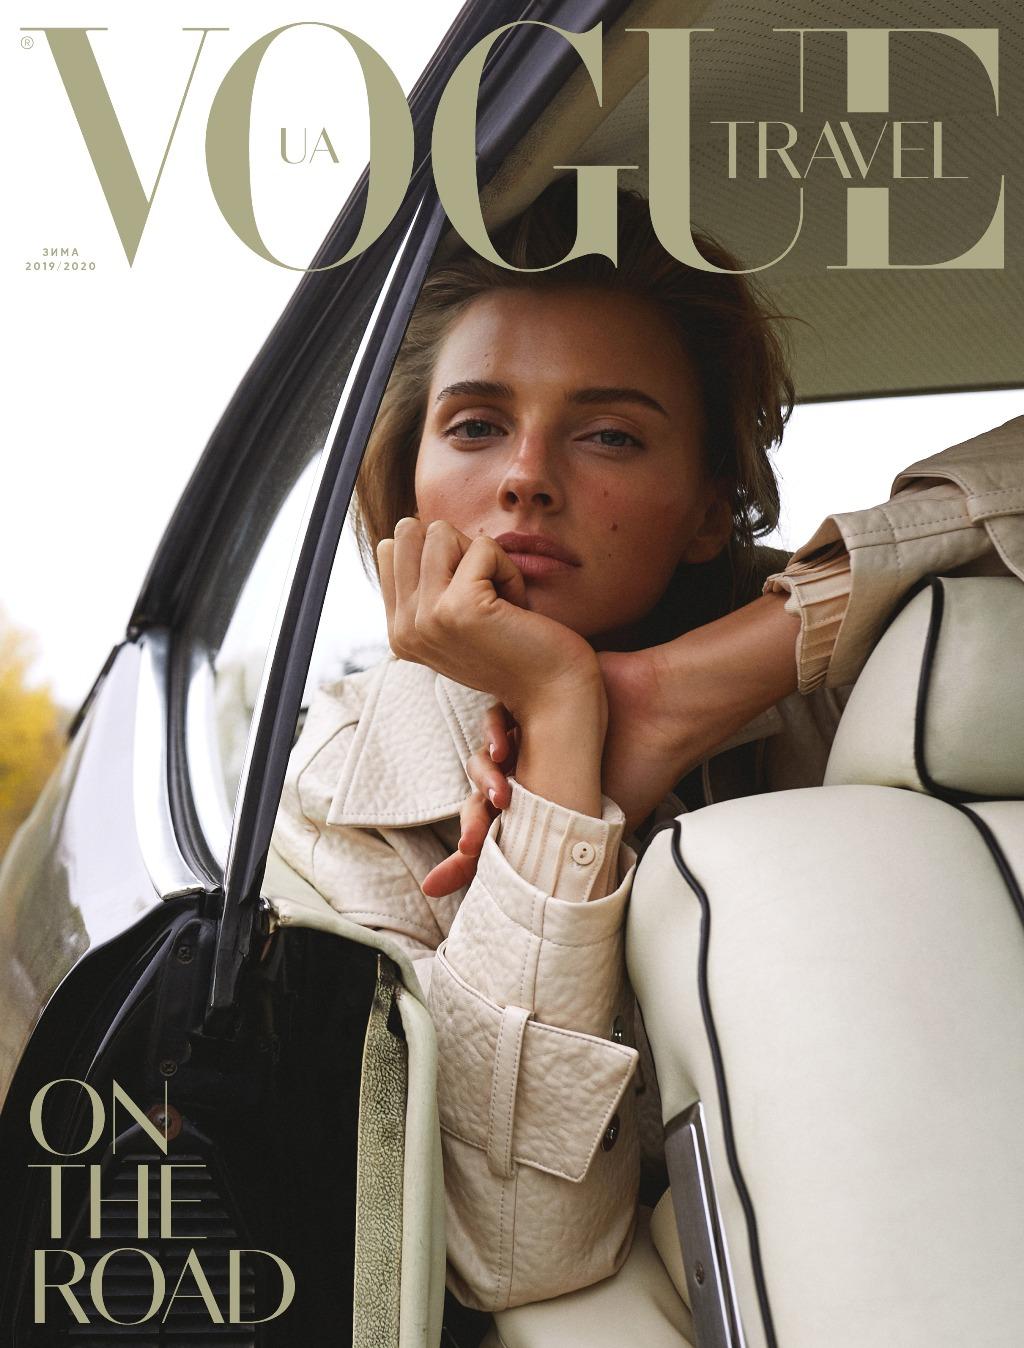 Reserved Vogue Travel